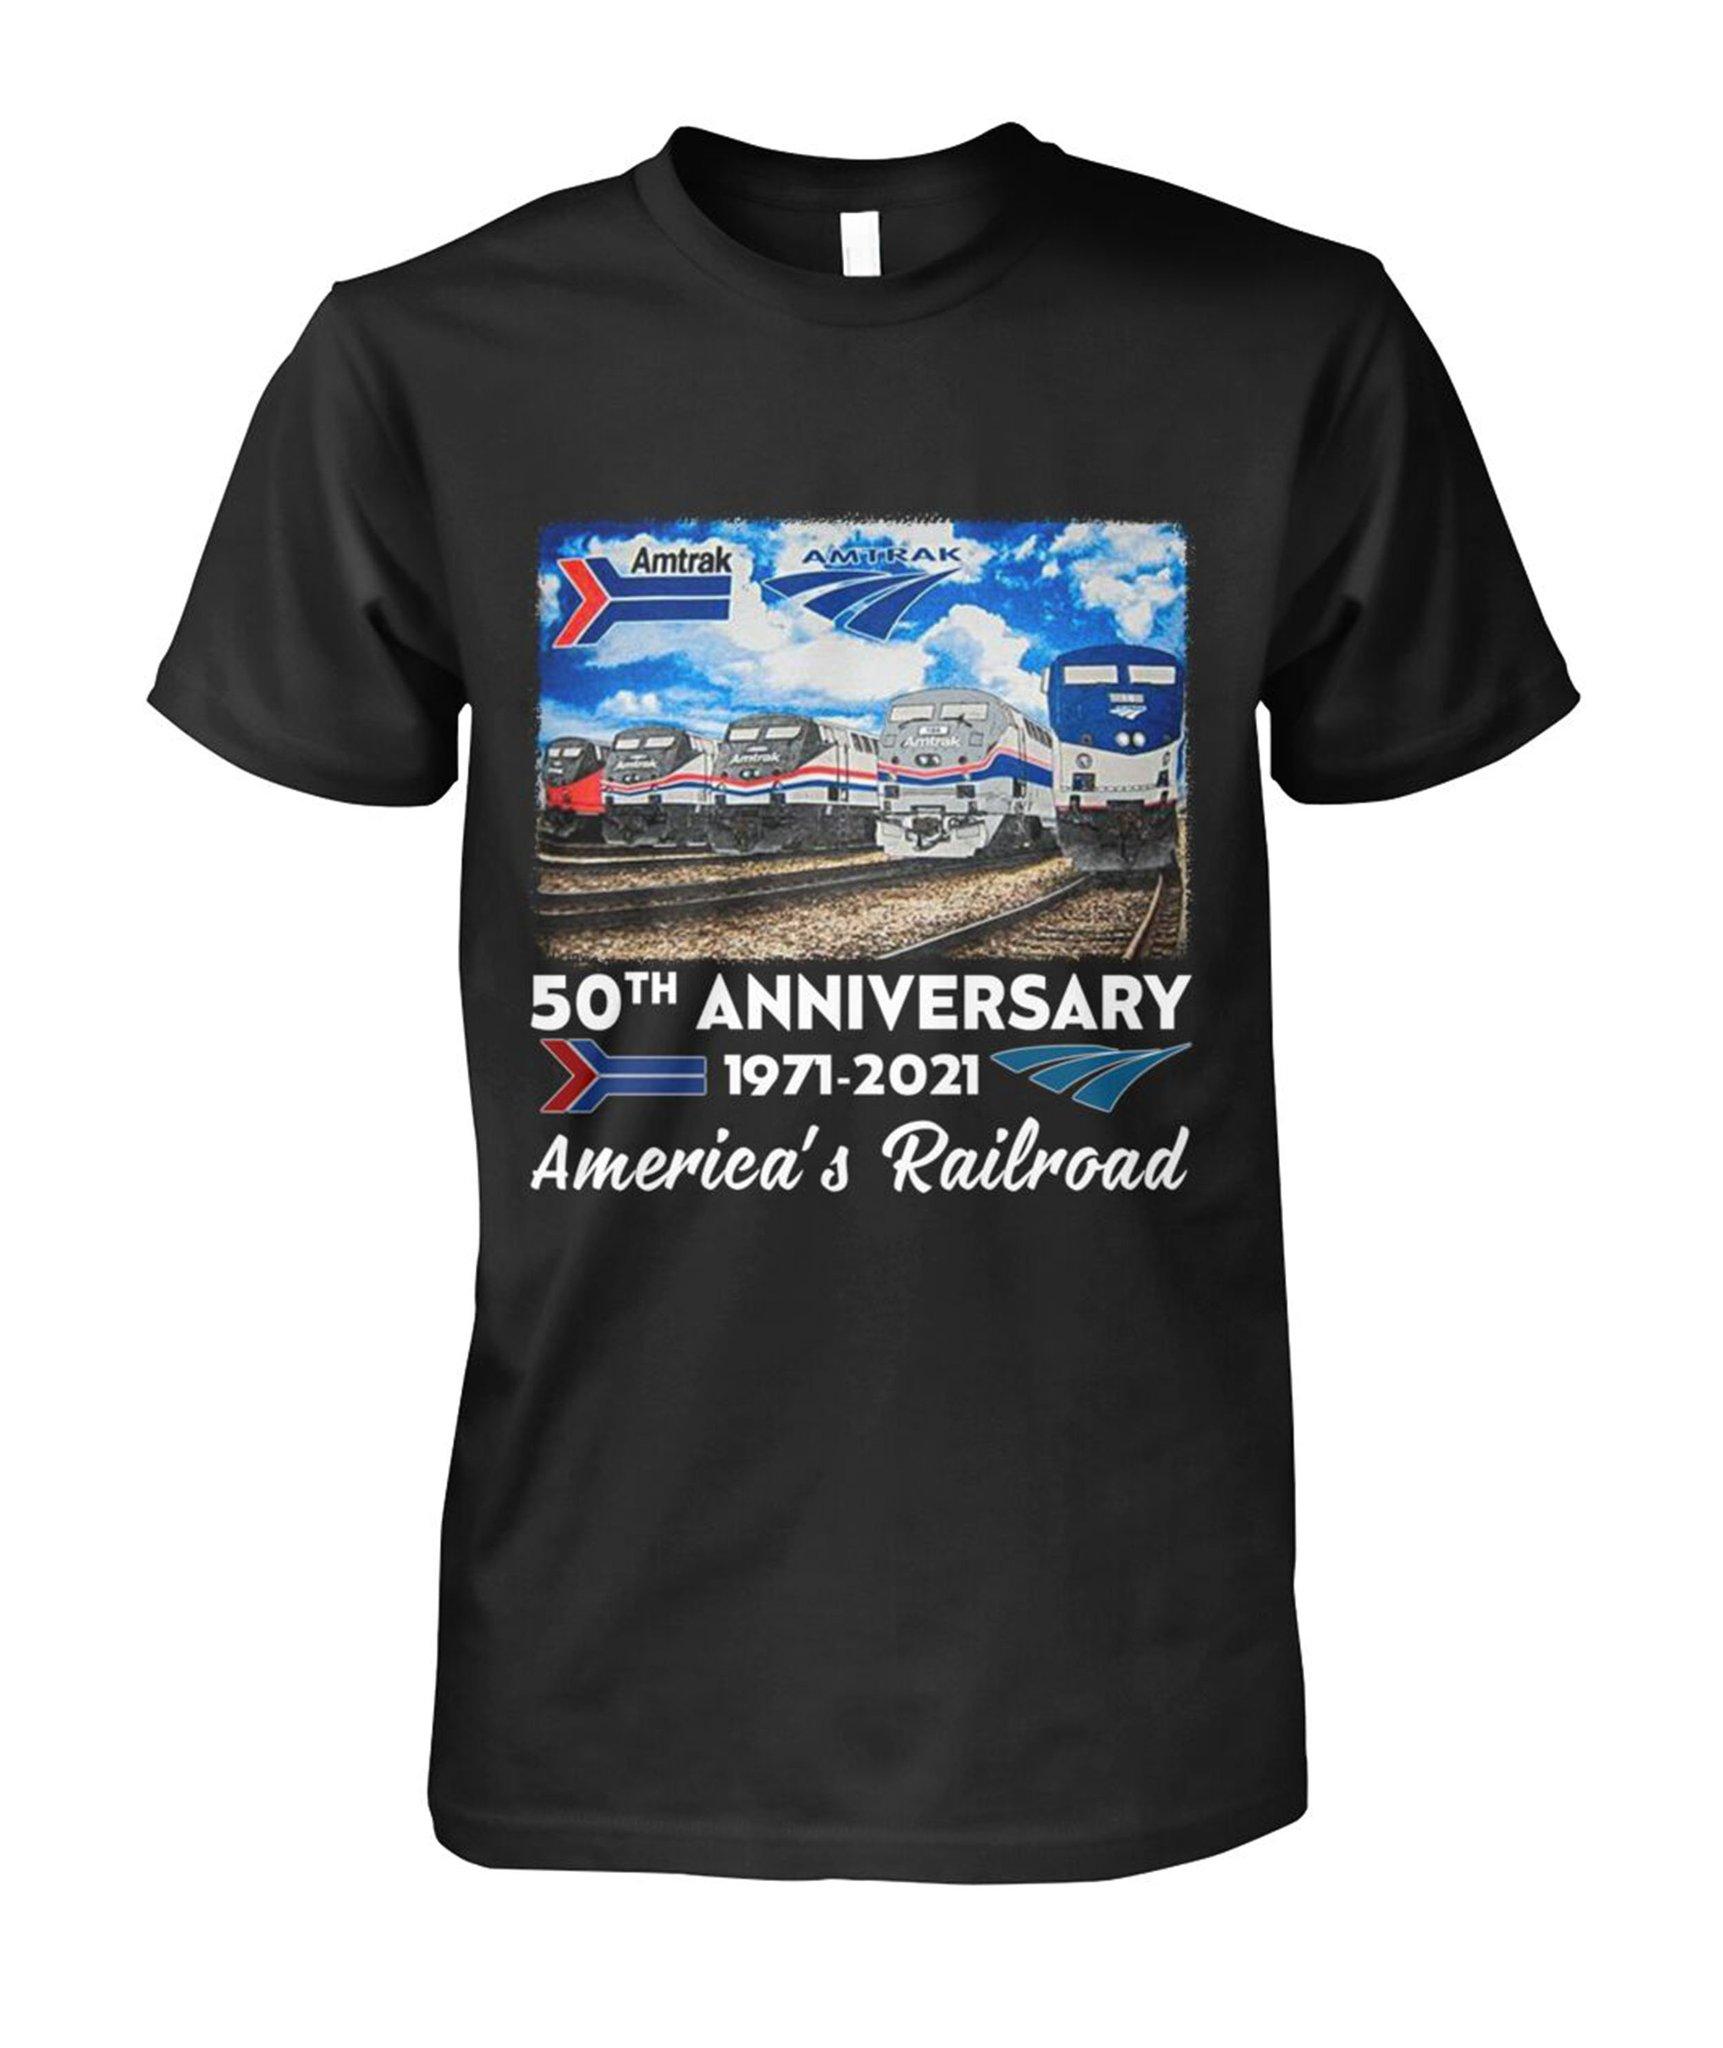 50th Anniversary 1971 2021 America's Railroad Shirt 13